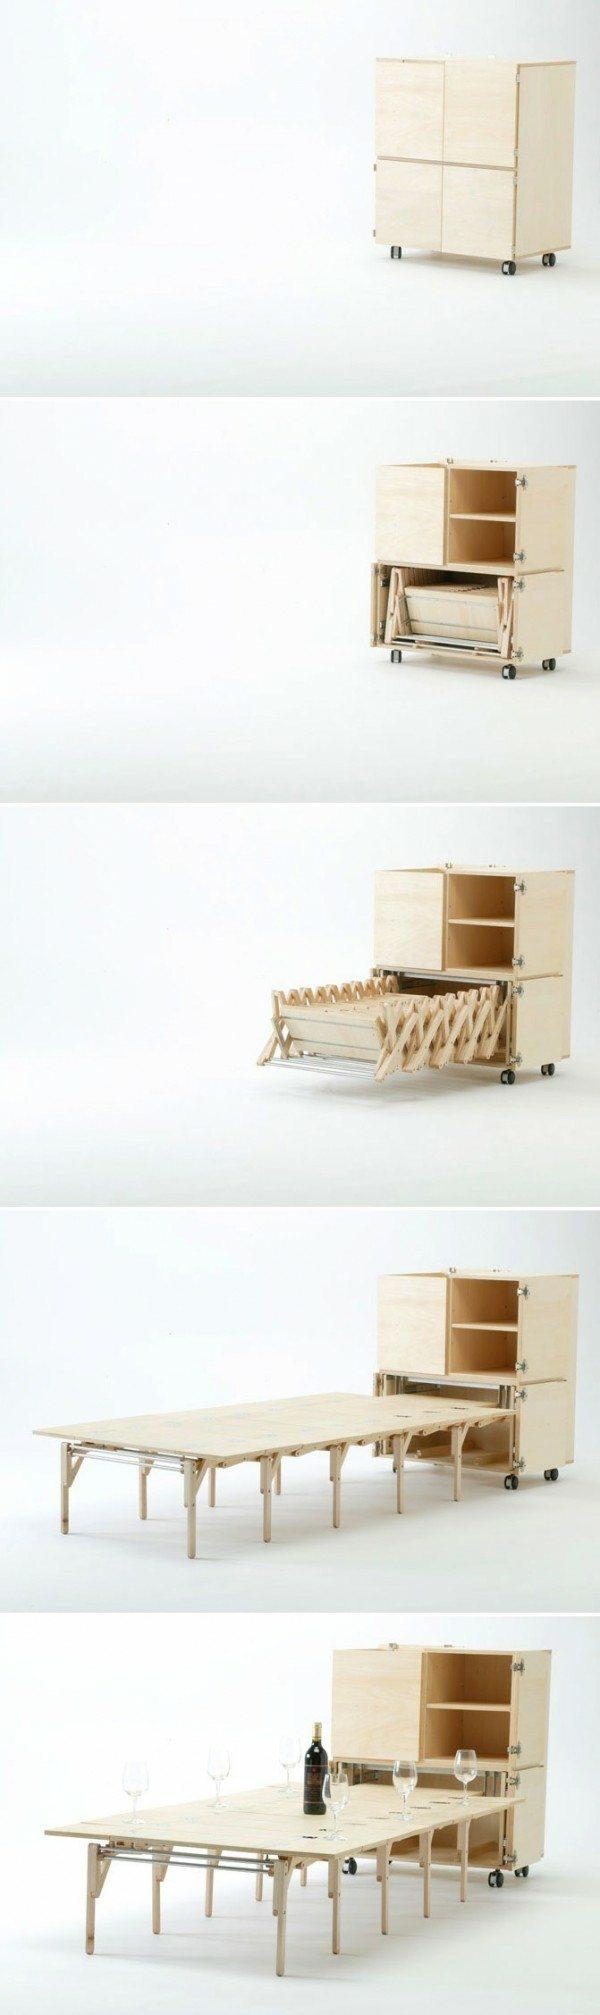 armoire bois table manger Nobuhiro Teshima